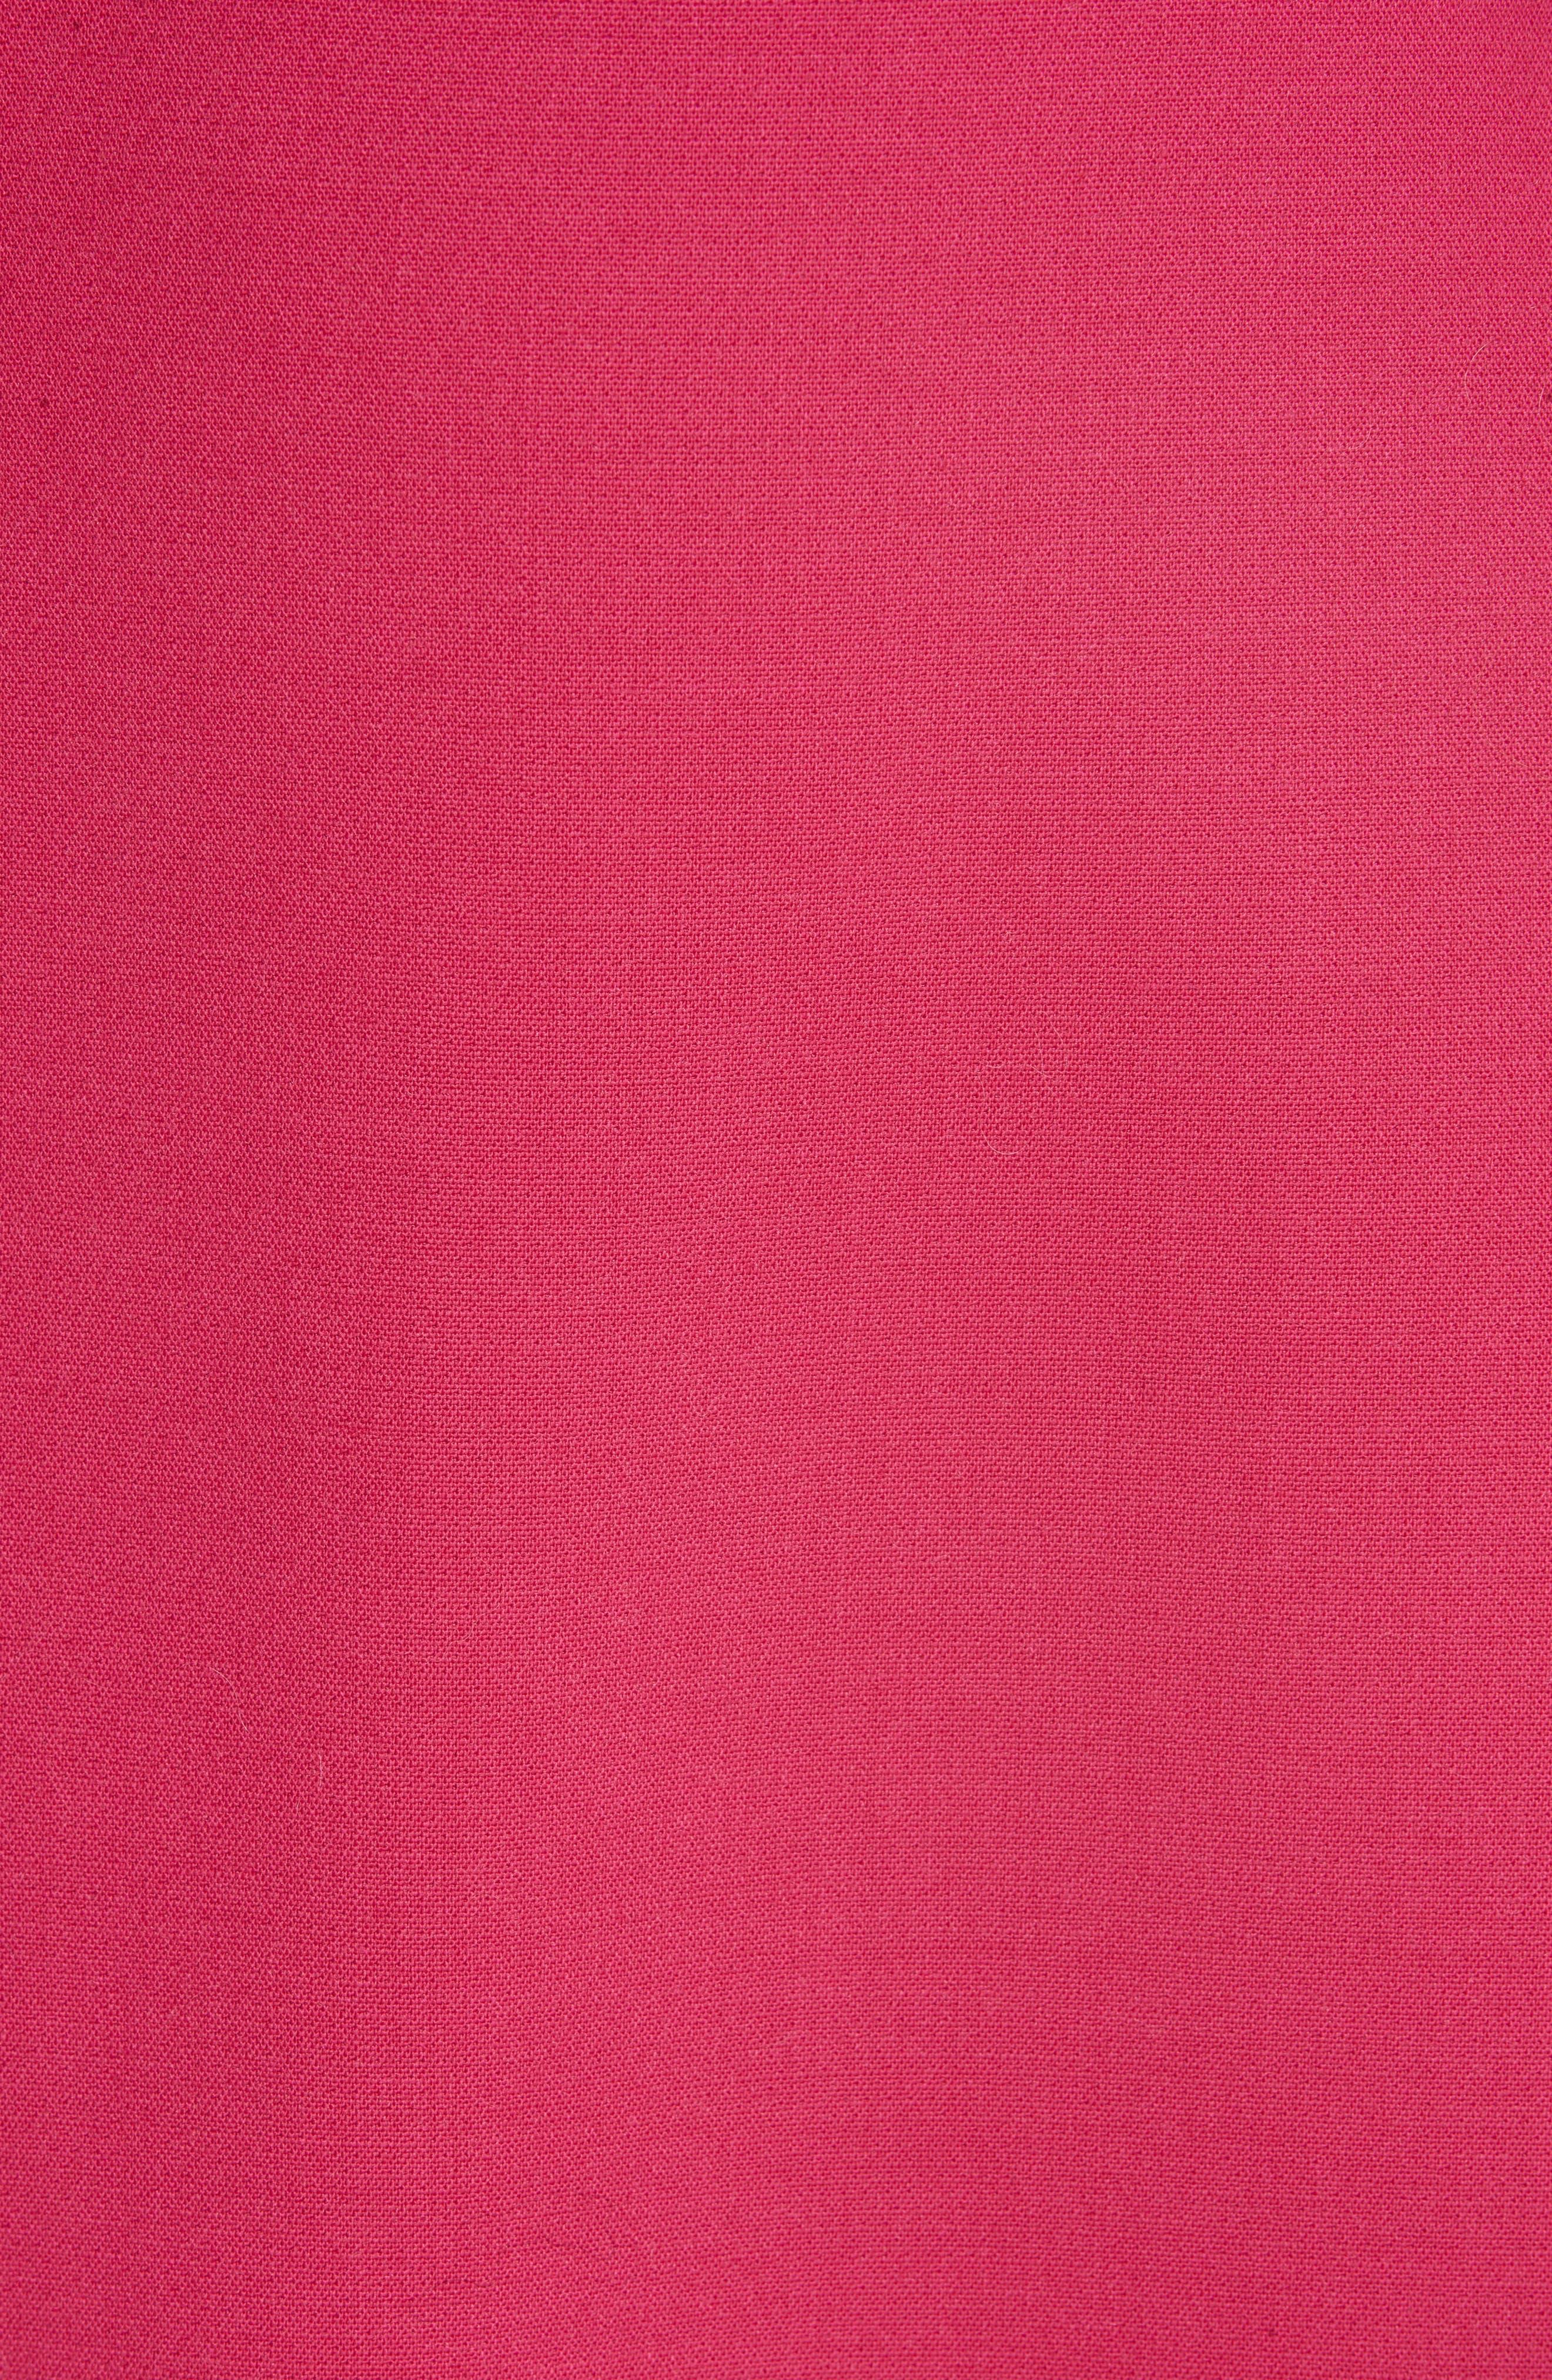 Zip Front A-Line Skirt,                             Alternate thumbnail 5, color,                             FUCHSIA